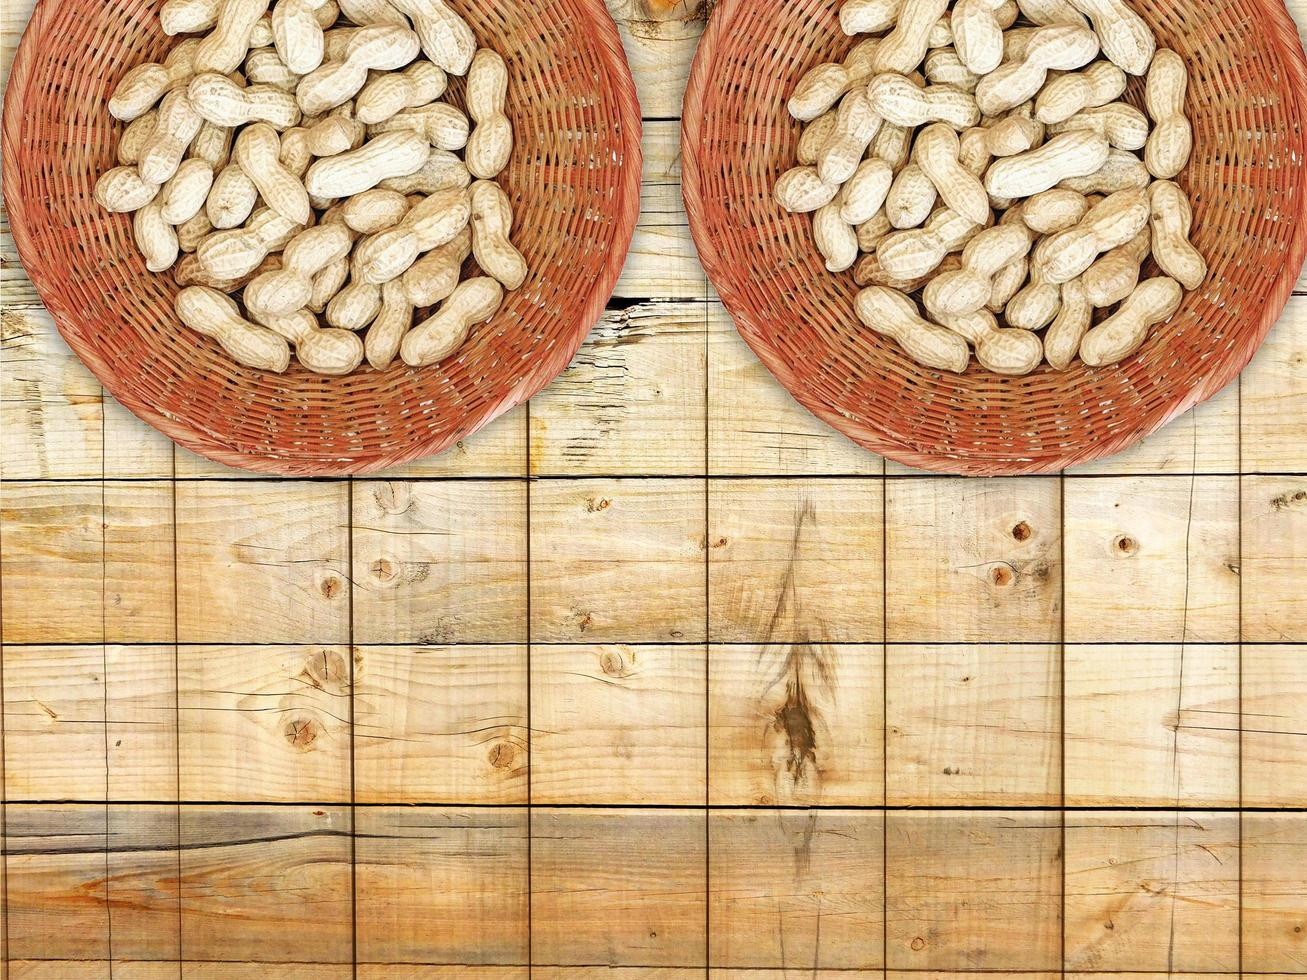 Peanuts in wicker baskets on wooden background photo